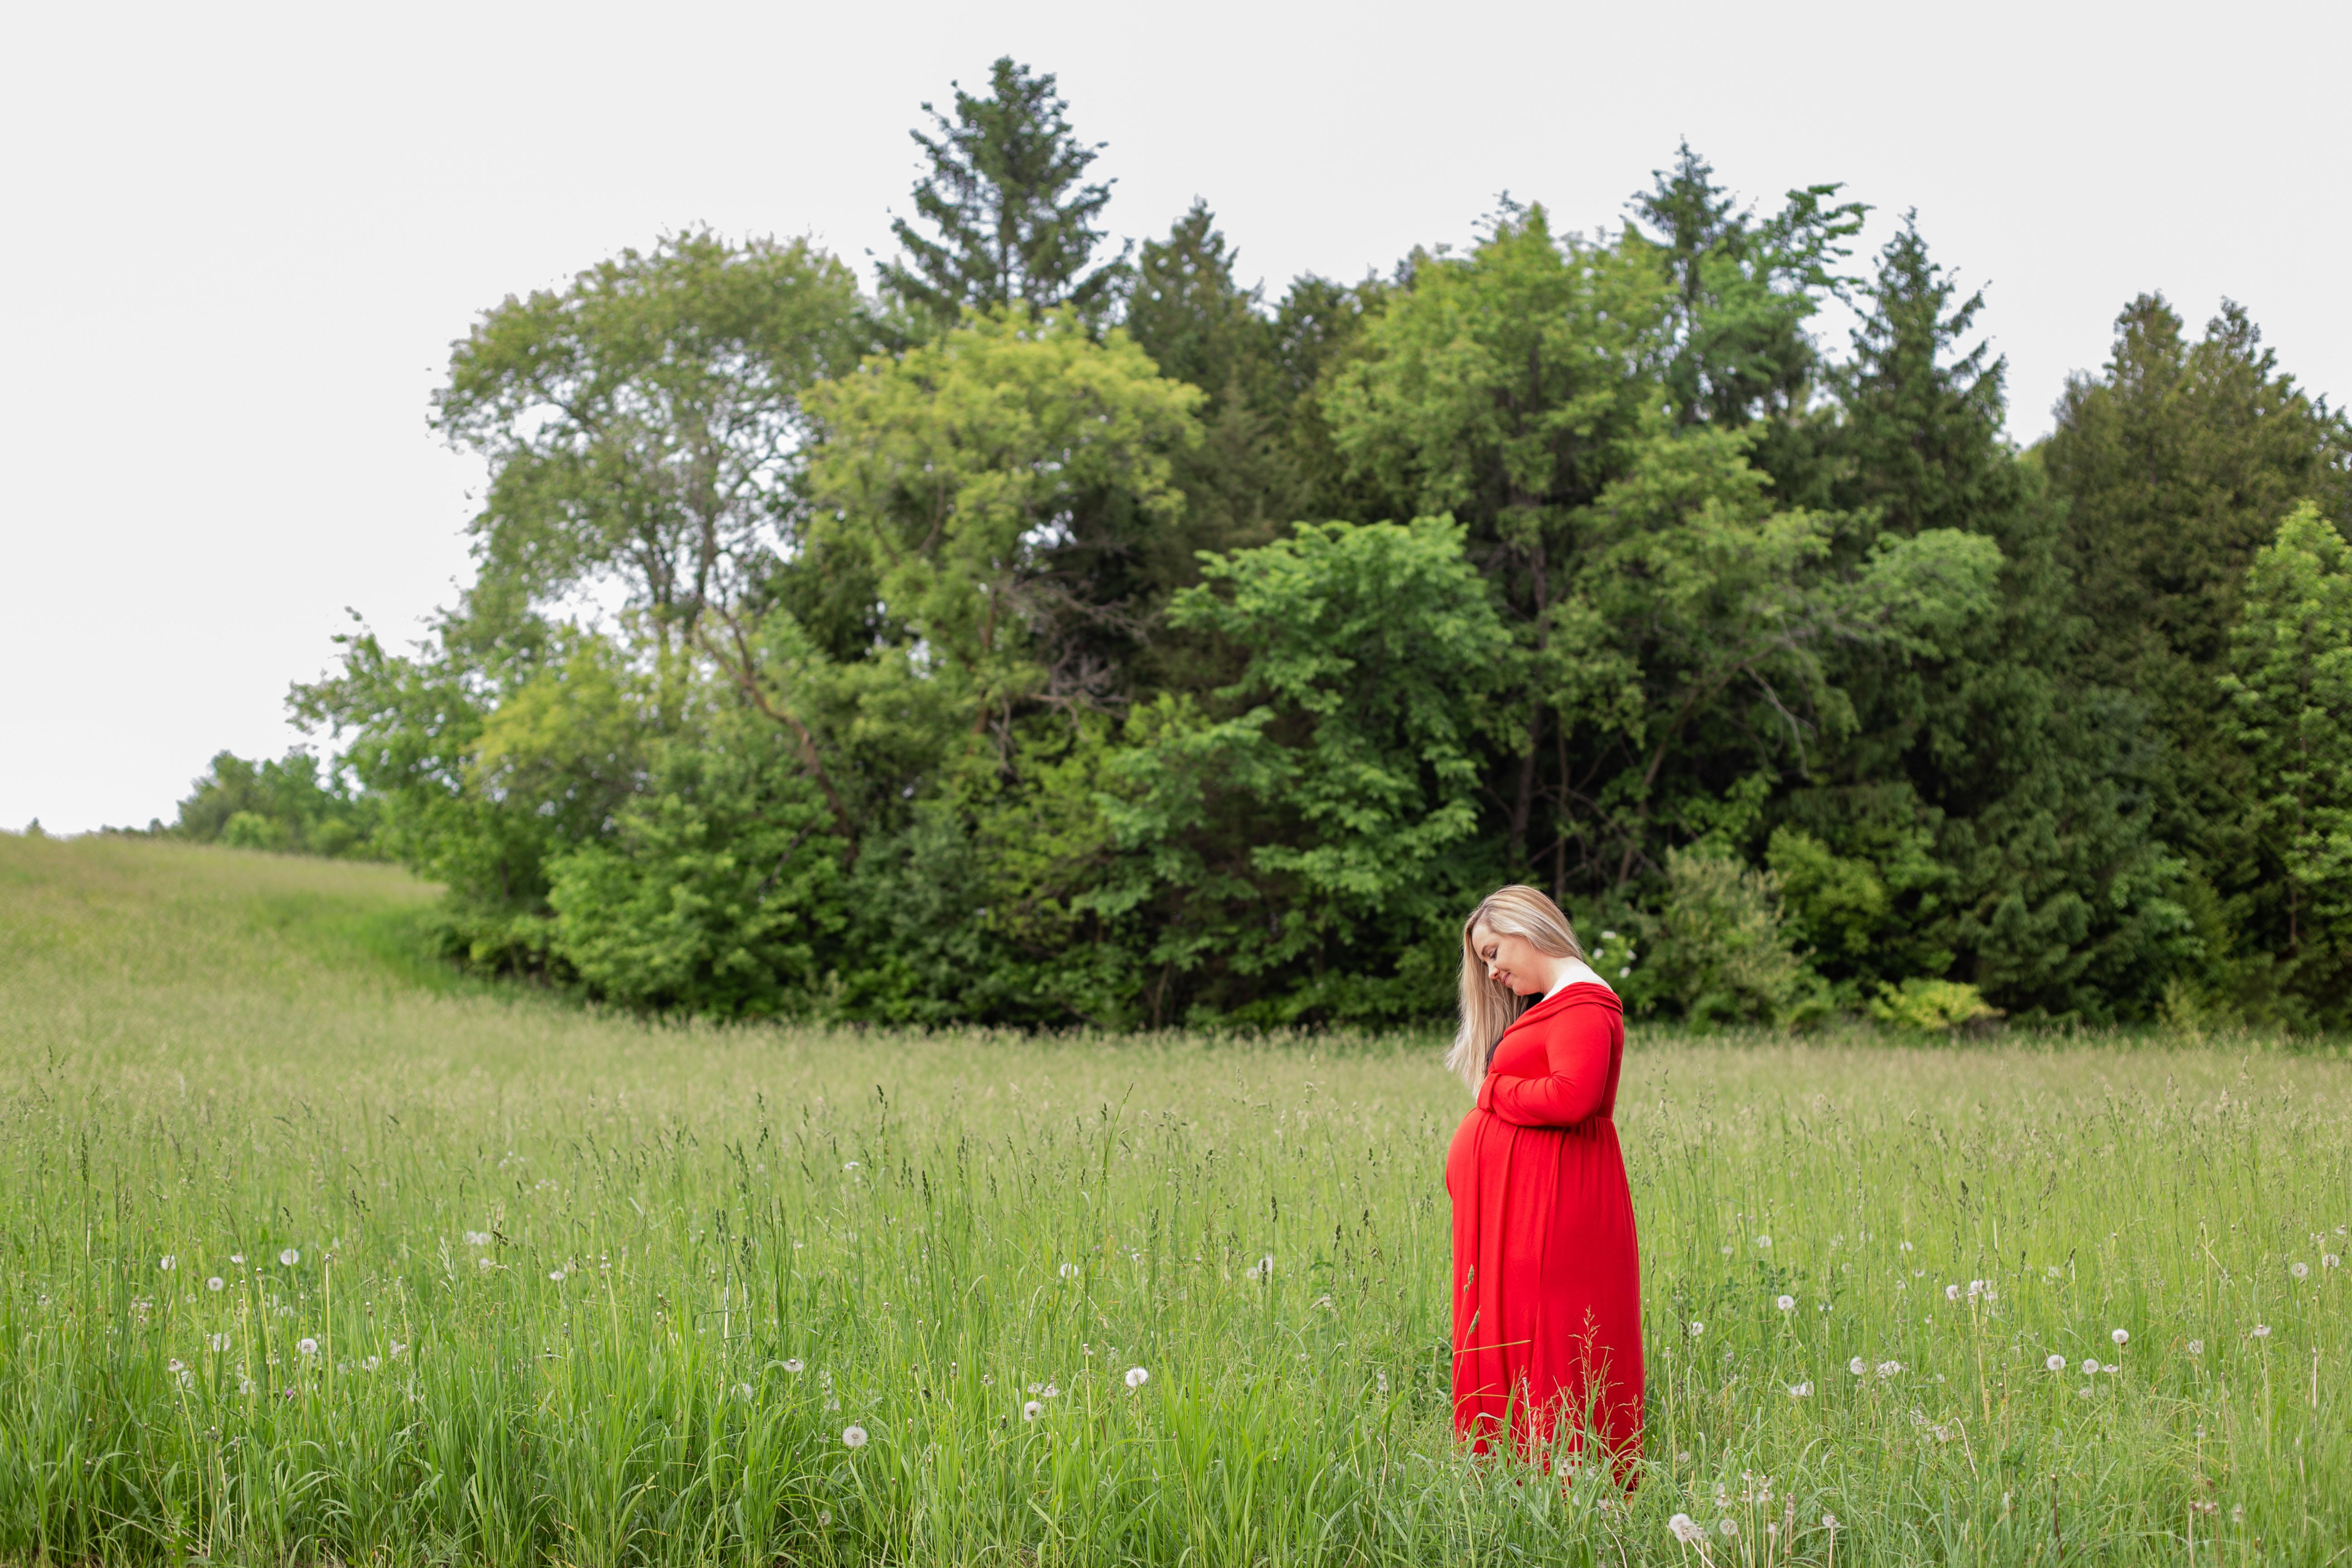 Field Maternity Photography Portrait